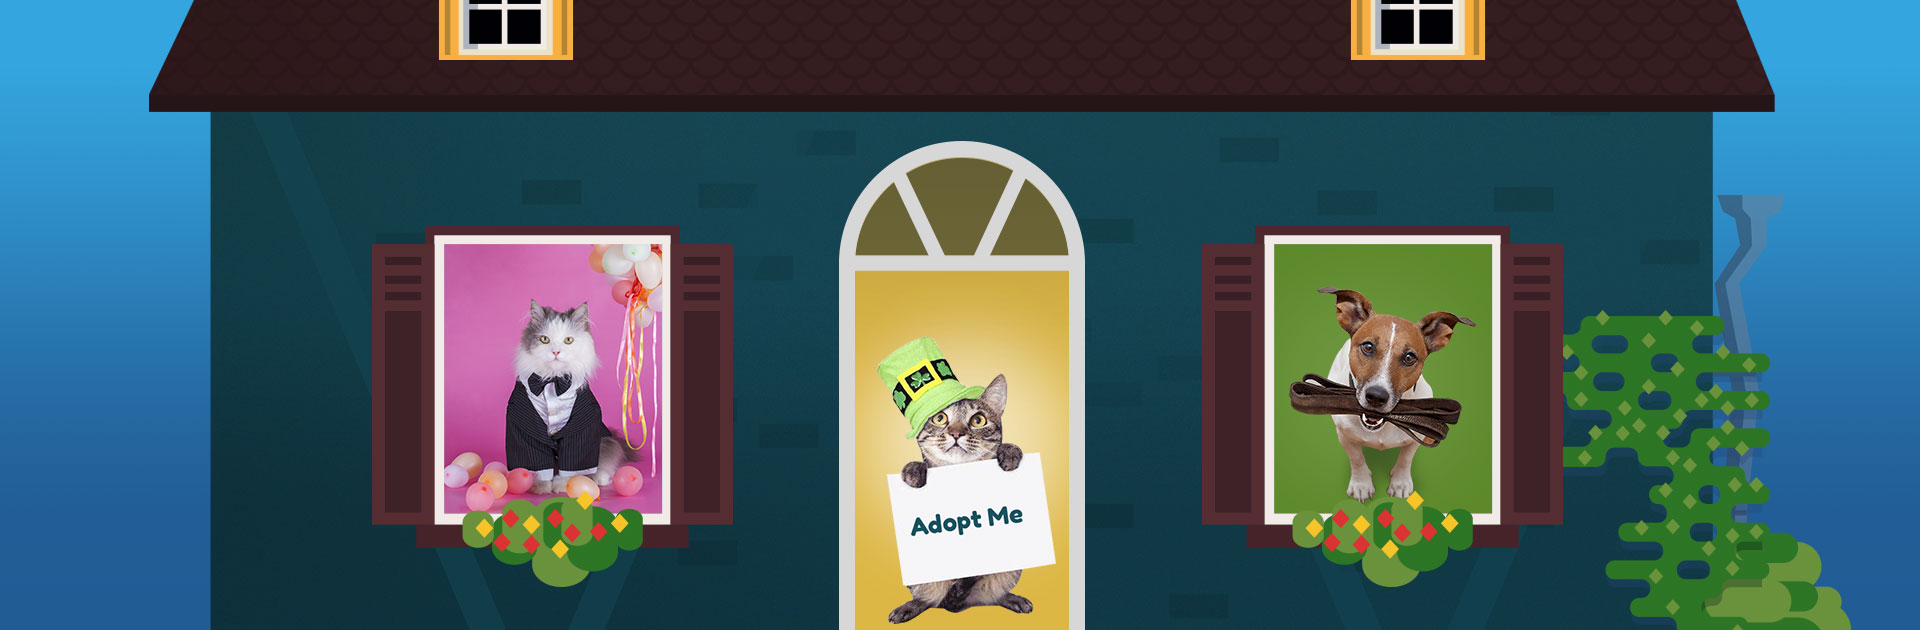 adoptme banner